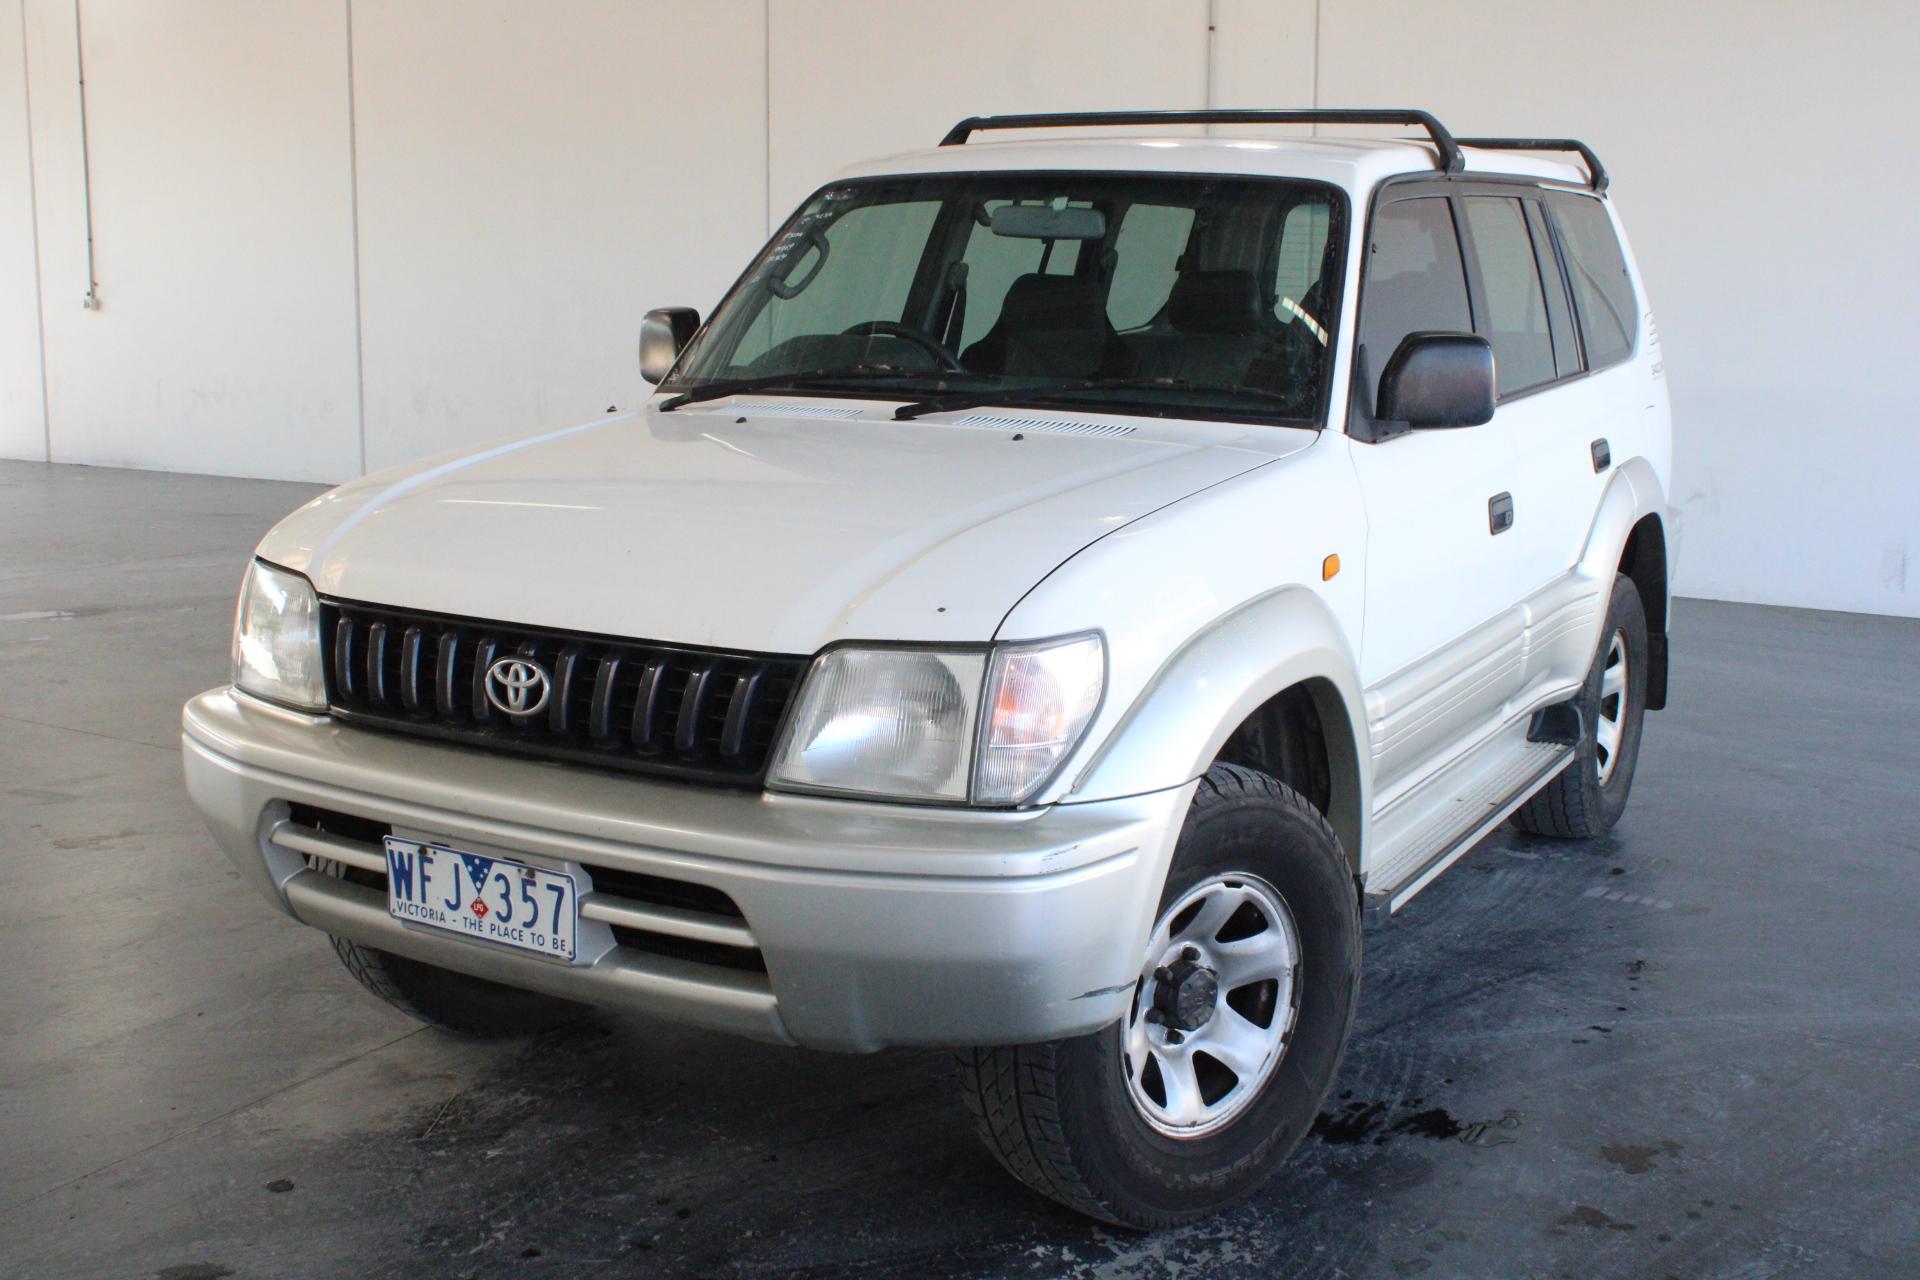 1998 Toyota Landcruiser Prado GXL (4x4) VZJ95R Automatic 7 Seats Wagon